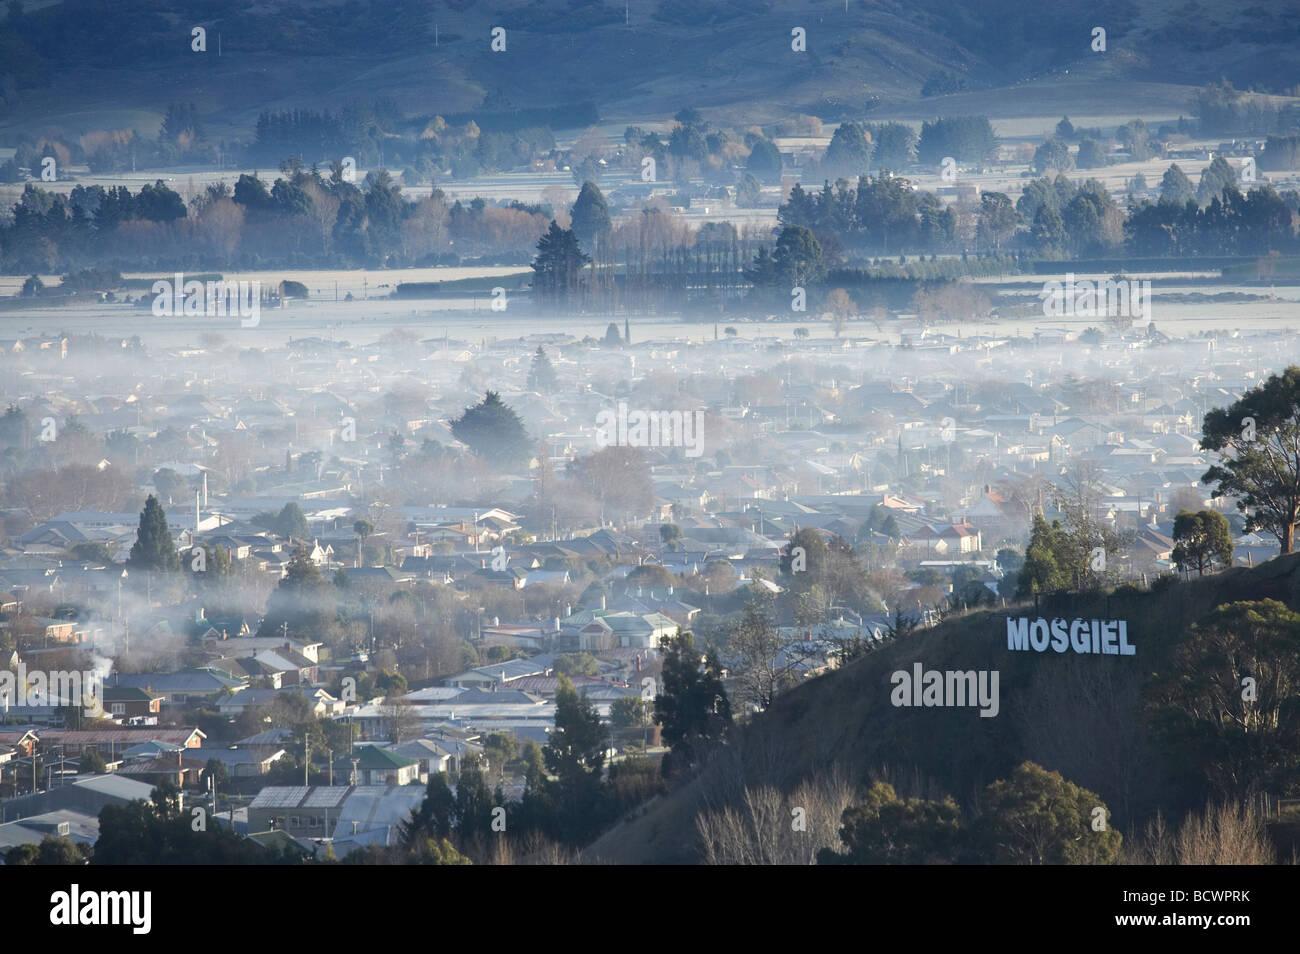 Winter Air Pollution over Mosgiel Dunedin Otago South Island New Zealand - Stock Image